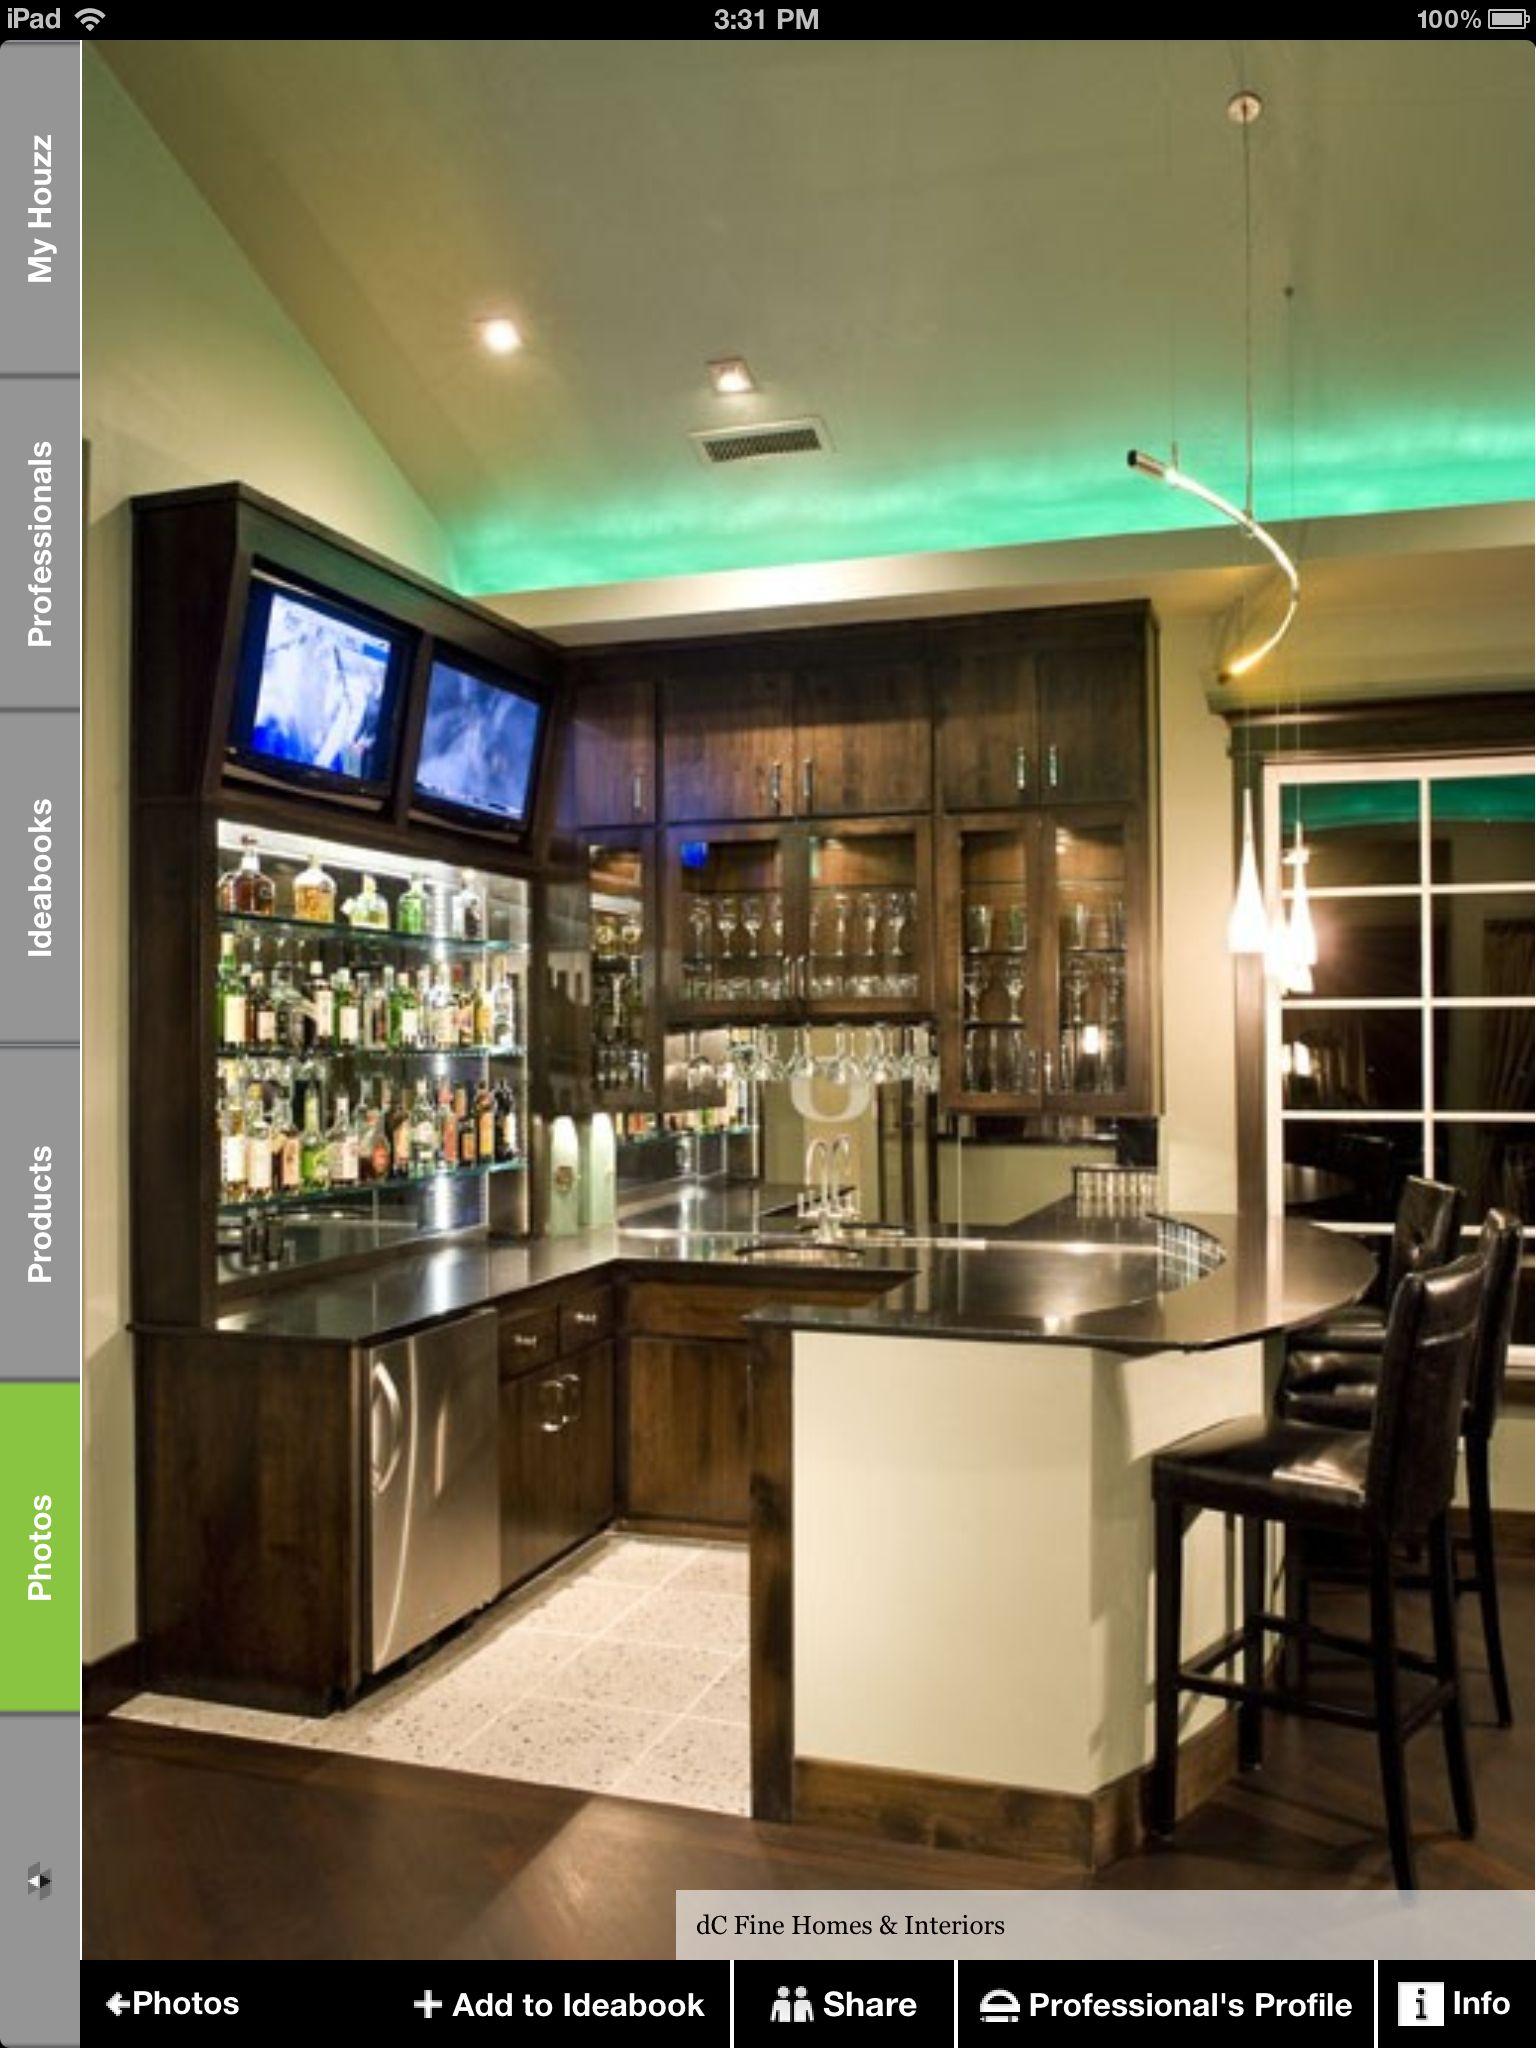 Ideas Deck Dream Home Decorating